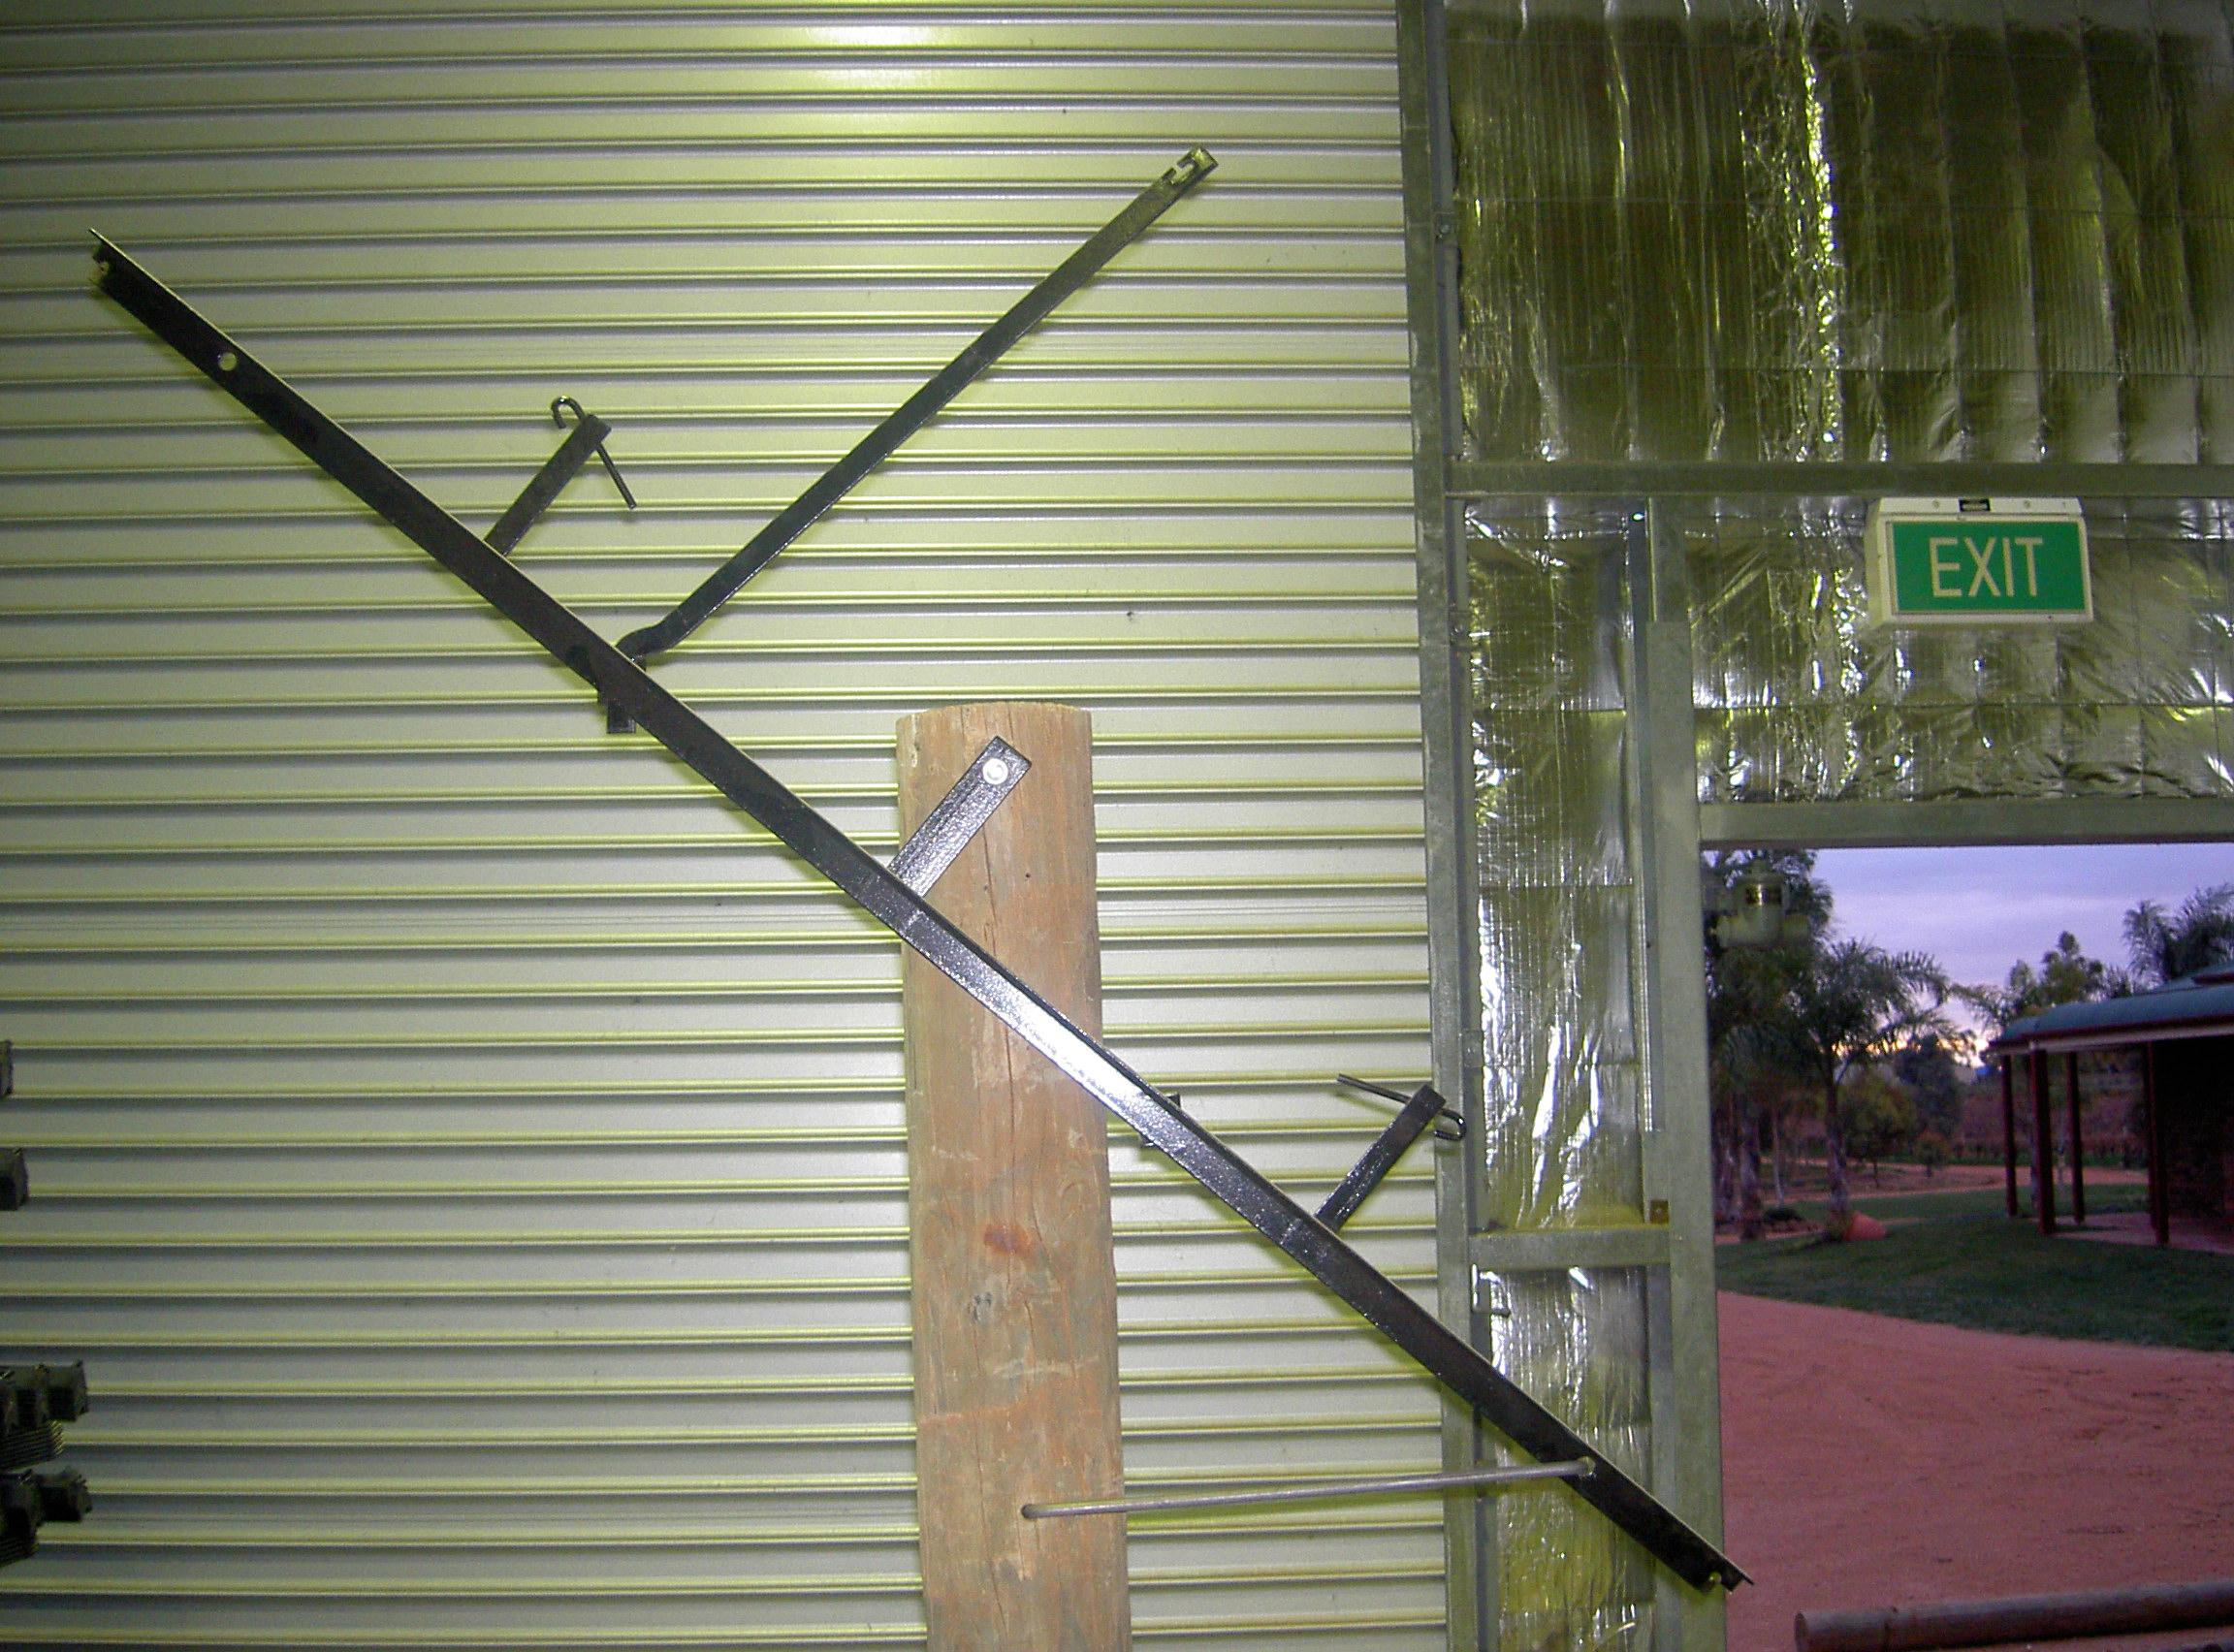 Shaw Swing Arm Trellis System